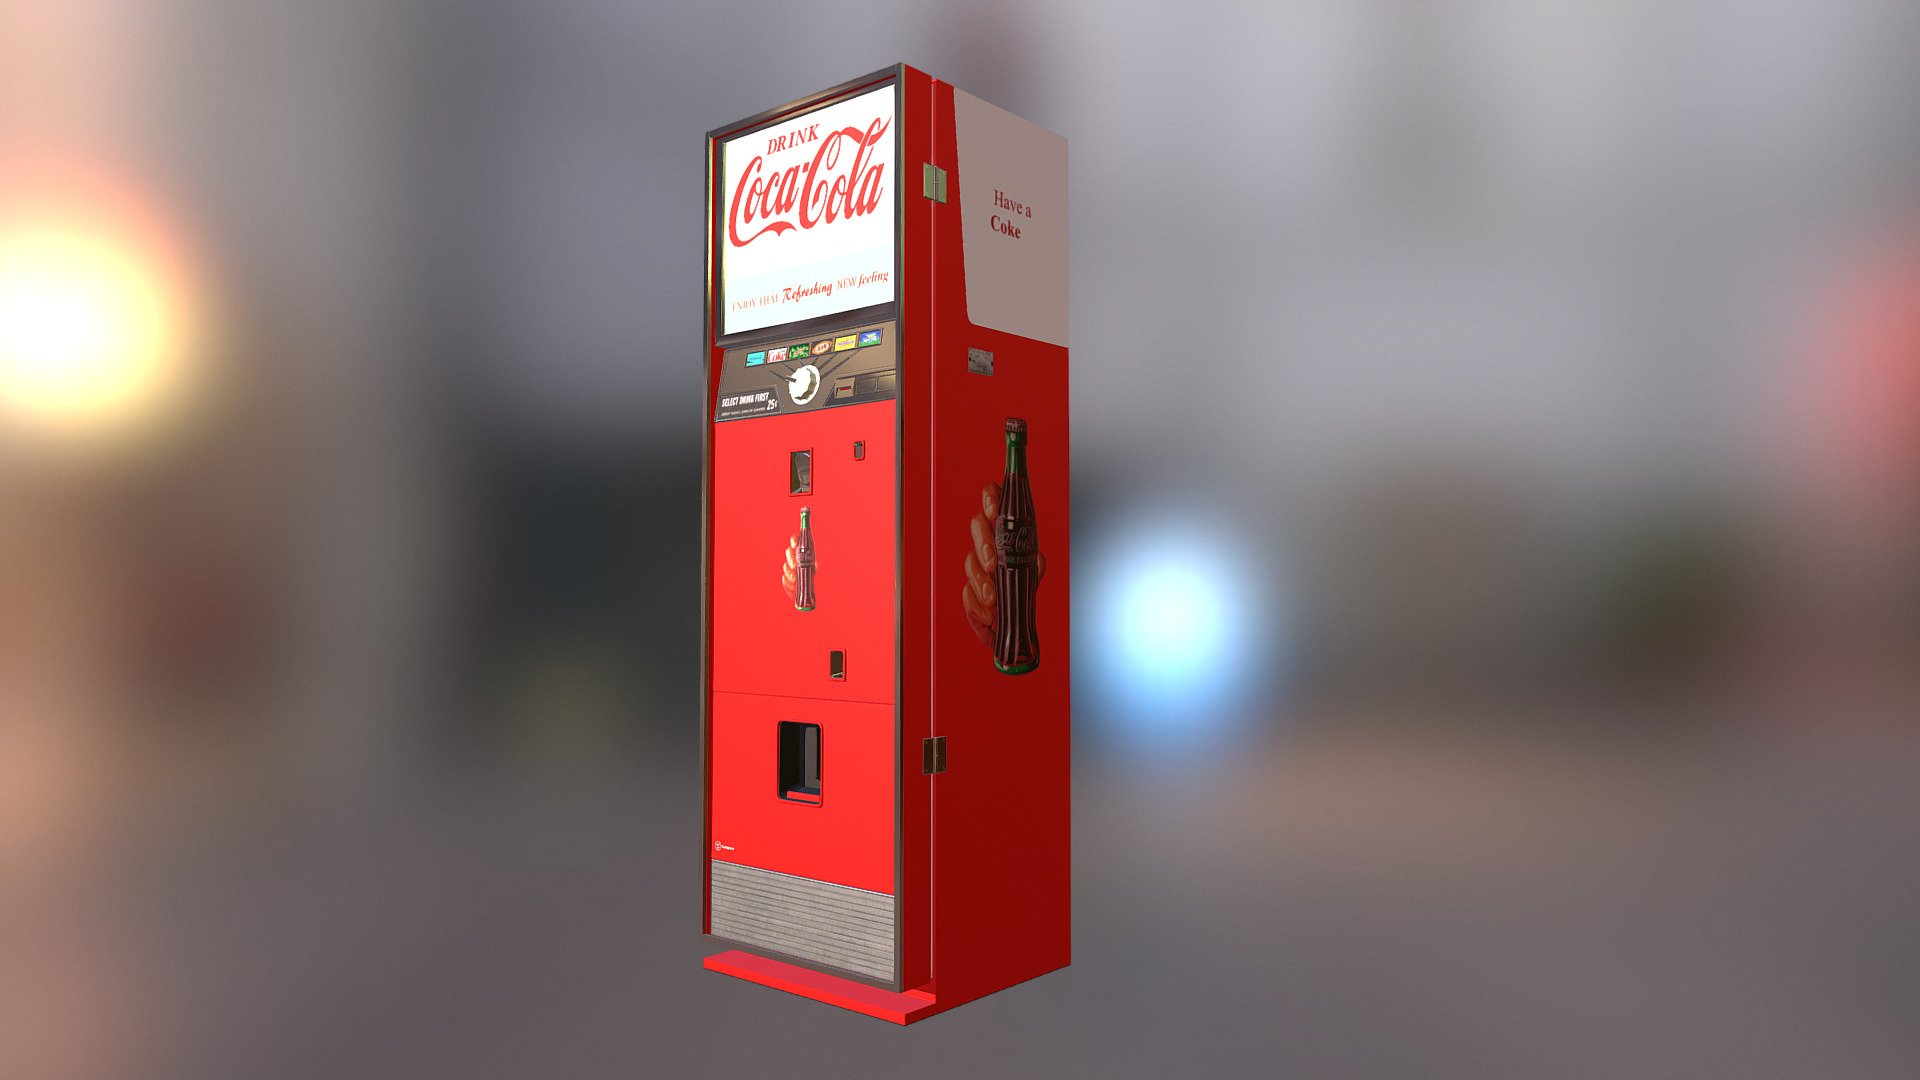 Coca-cola Vending Machine - Download Free 3D model by JFK ...